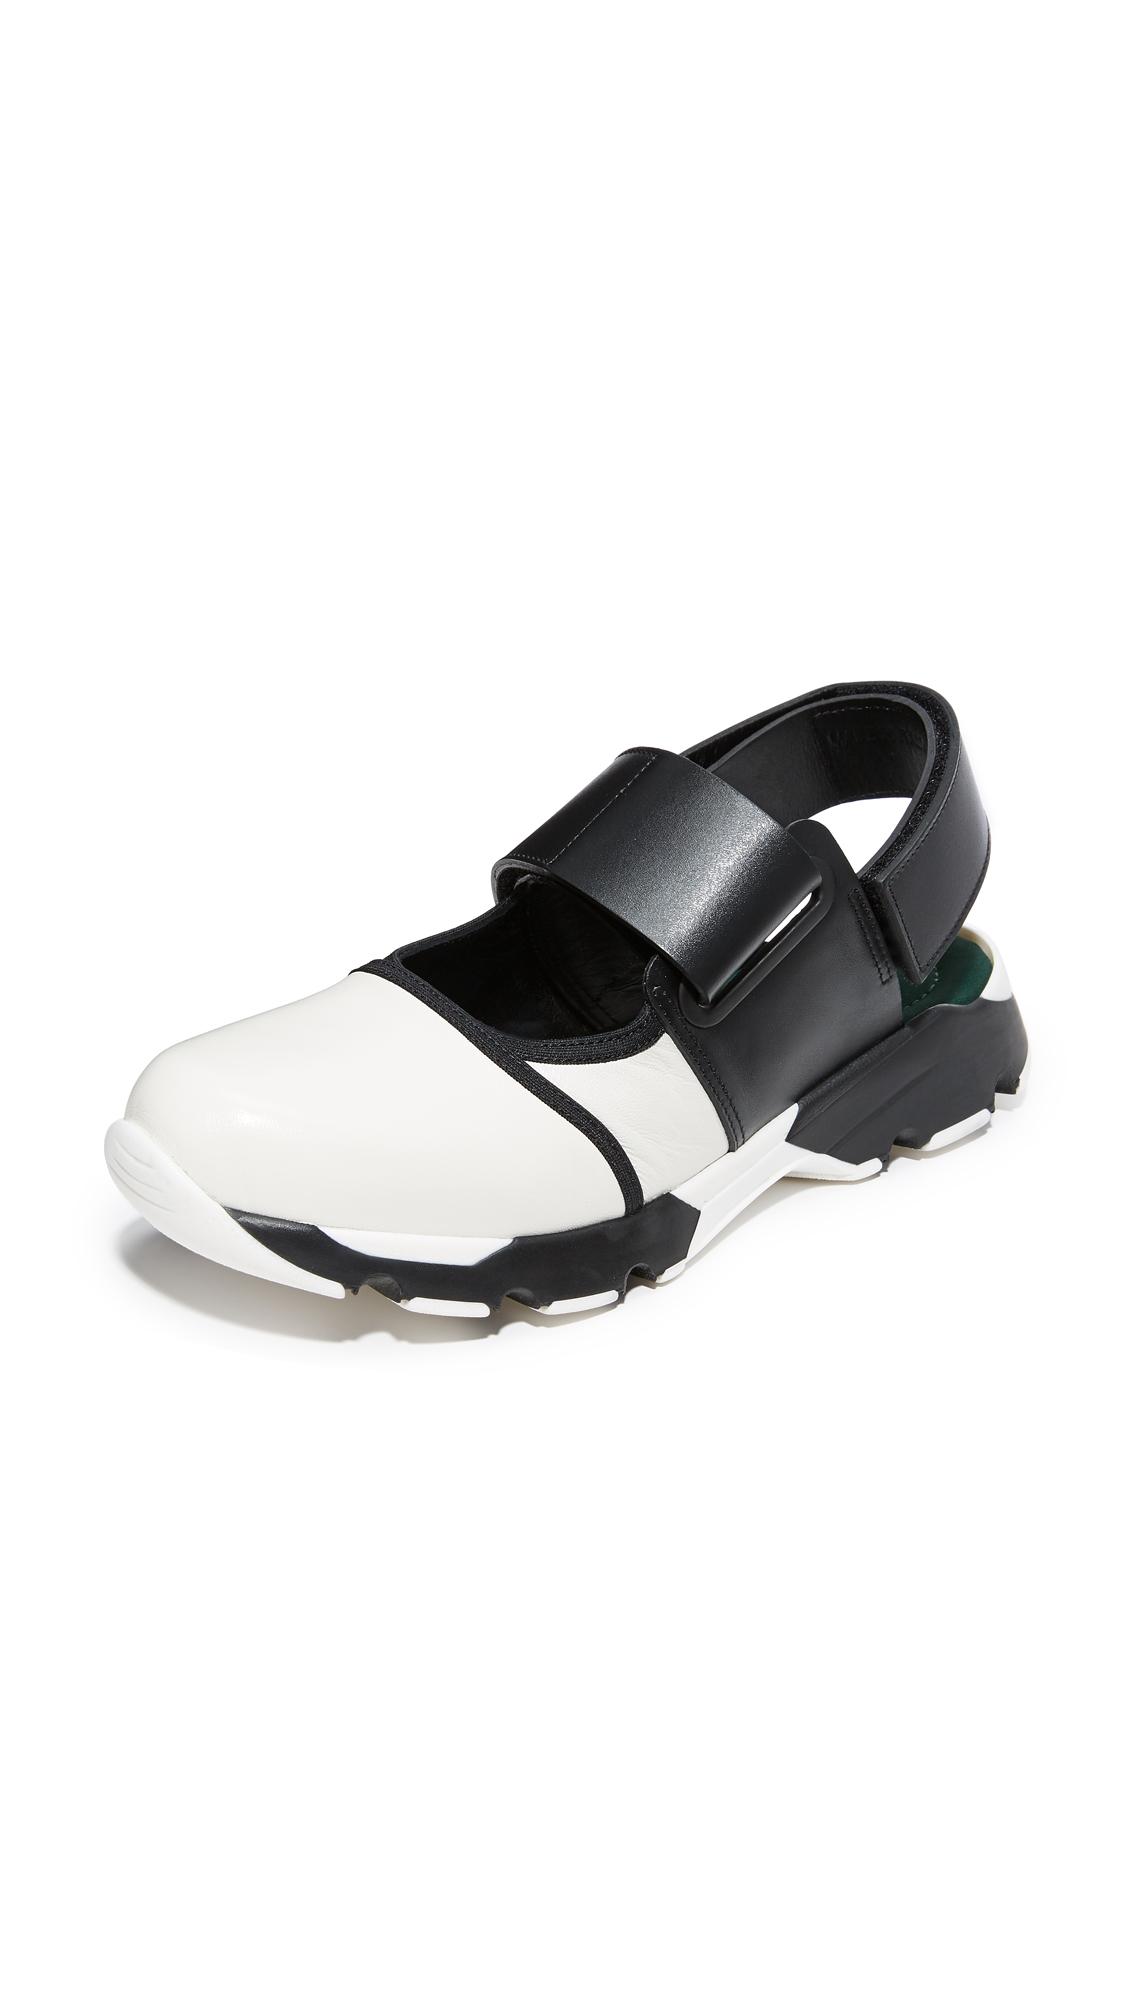 Marni Sneaker Flats - Limestone/Black